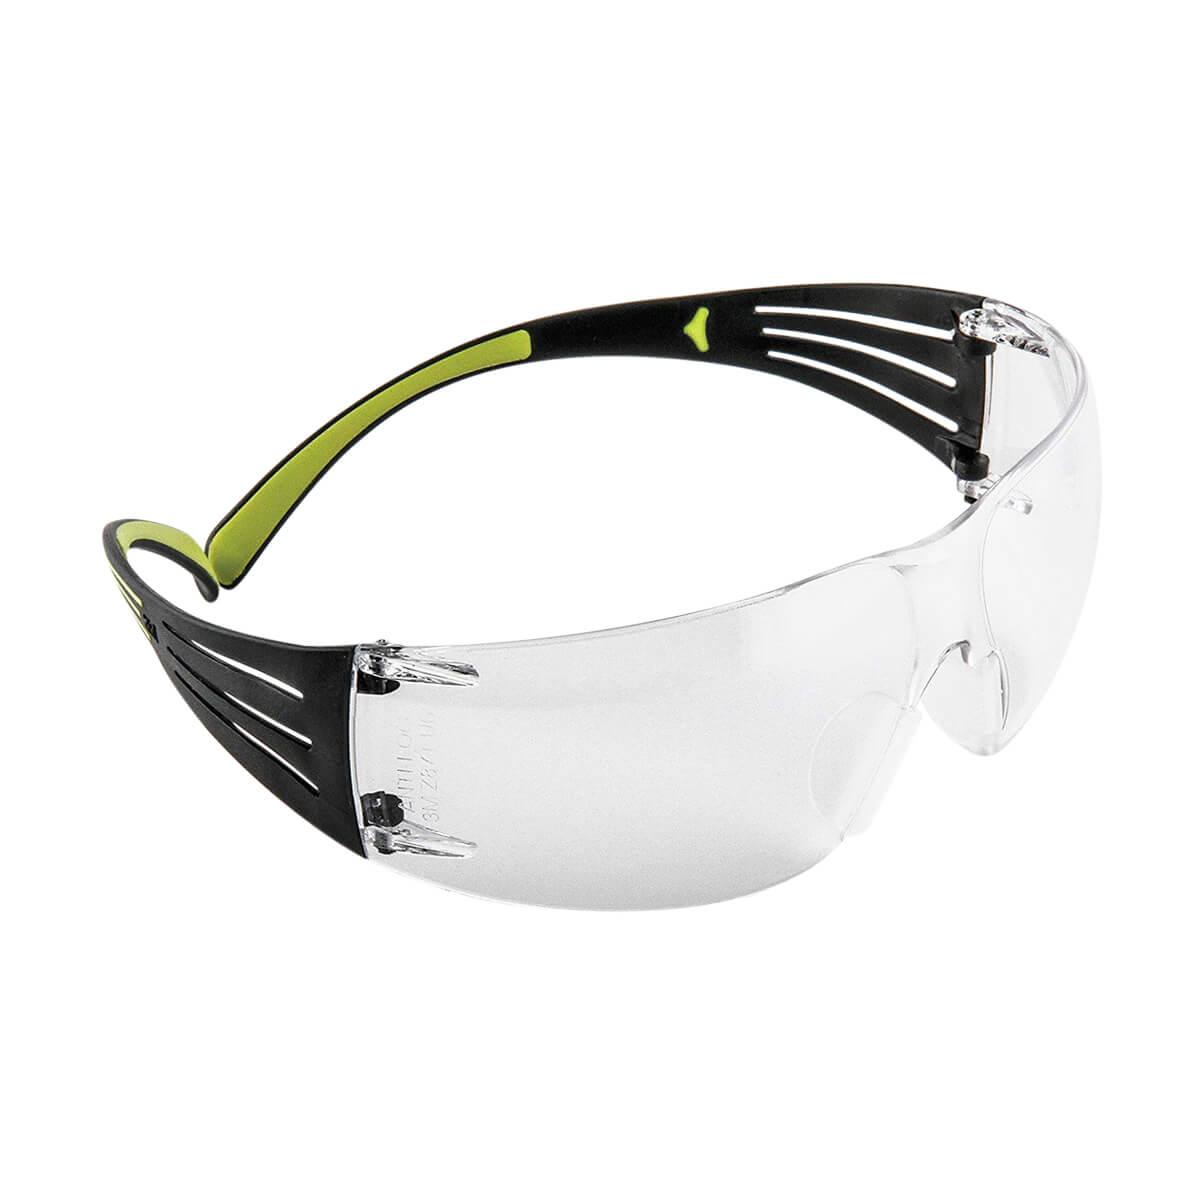 3M SecureFit® Safety Eyewear - Clear Lens | UFA